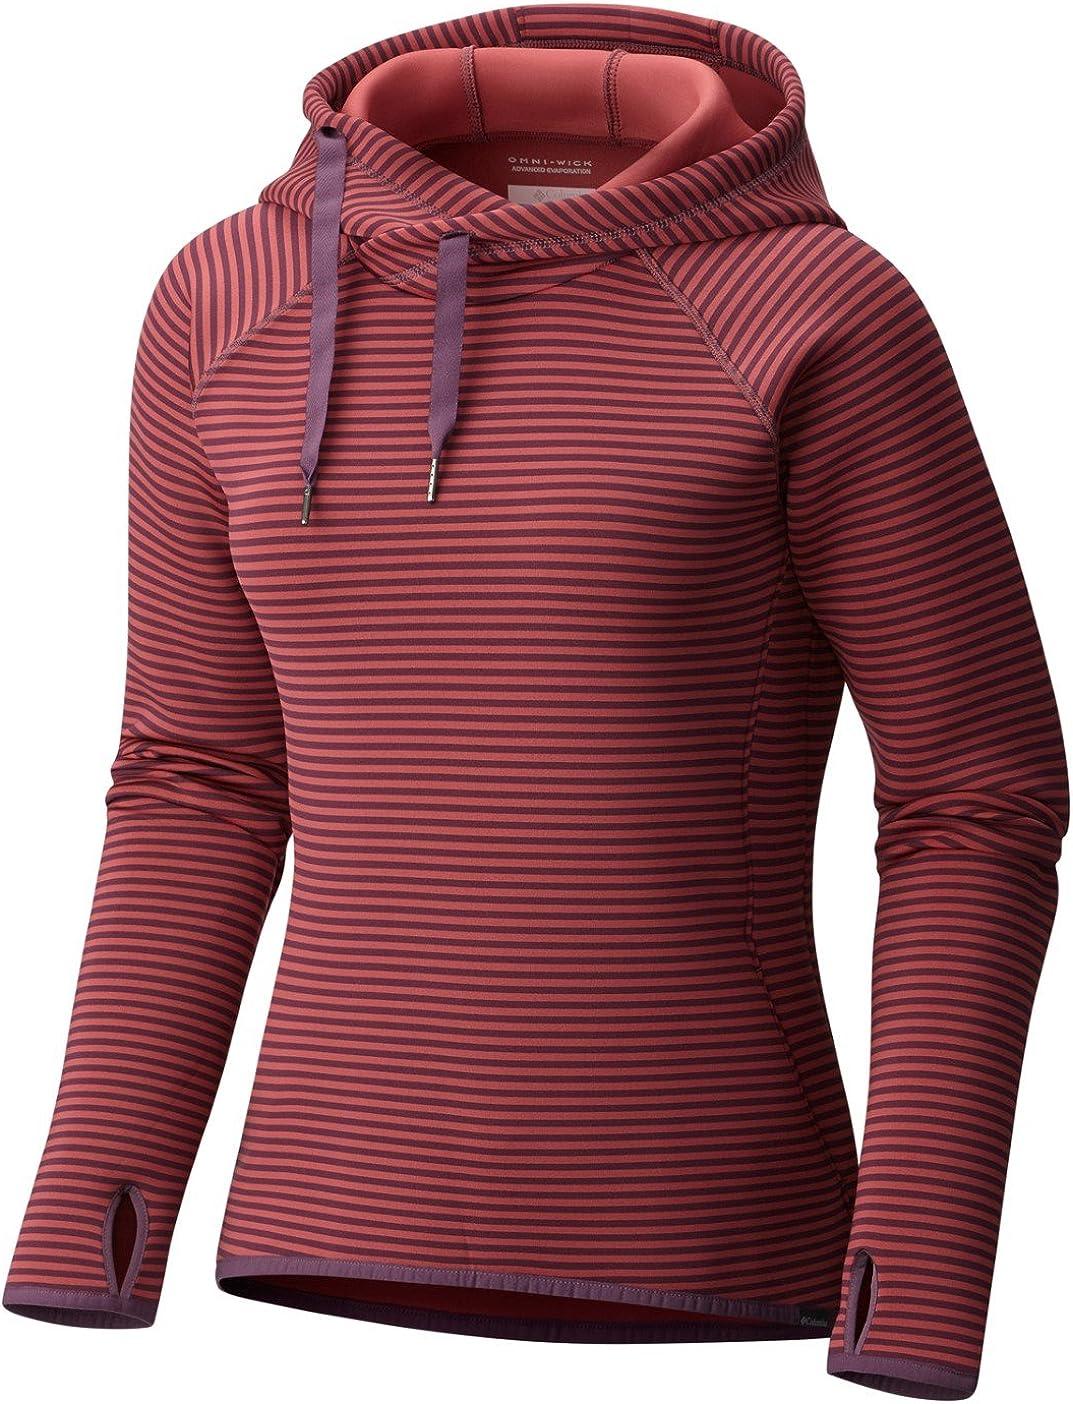 Popular brand in the world Columbia Women's Castella Special sale item Hoodie Peak